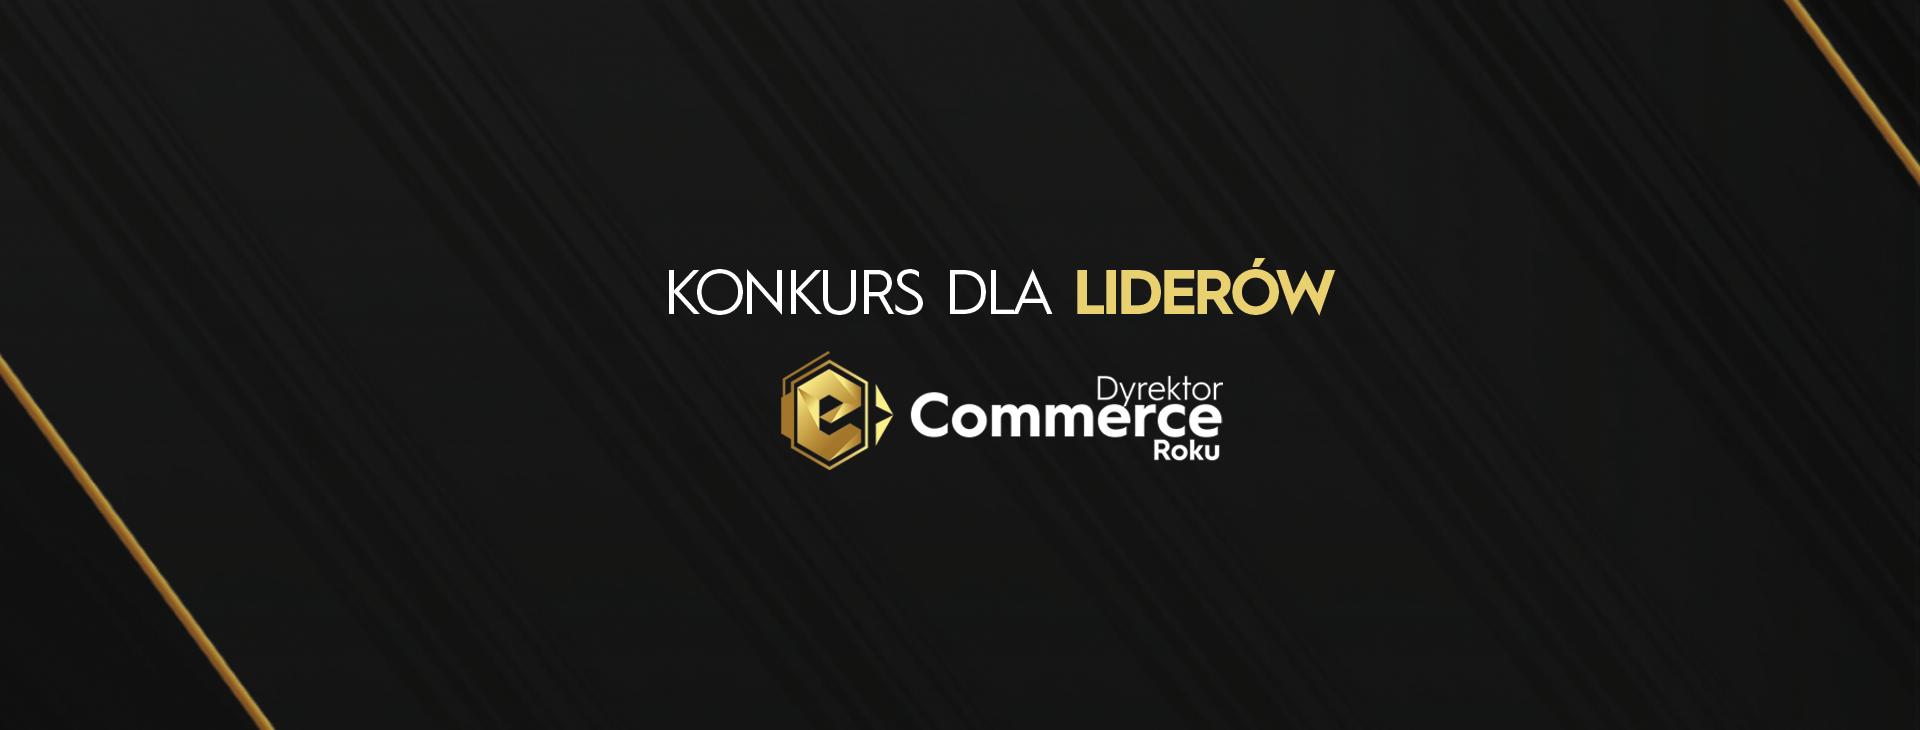 Wystartował Konkurs Dyrektor e-Commerce Roku 2020!